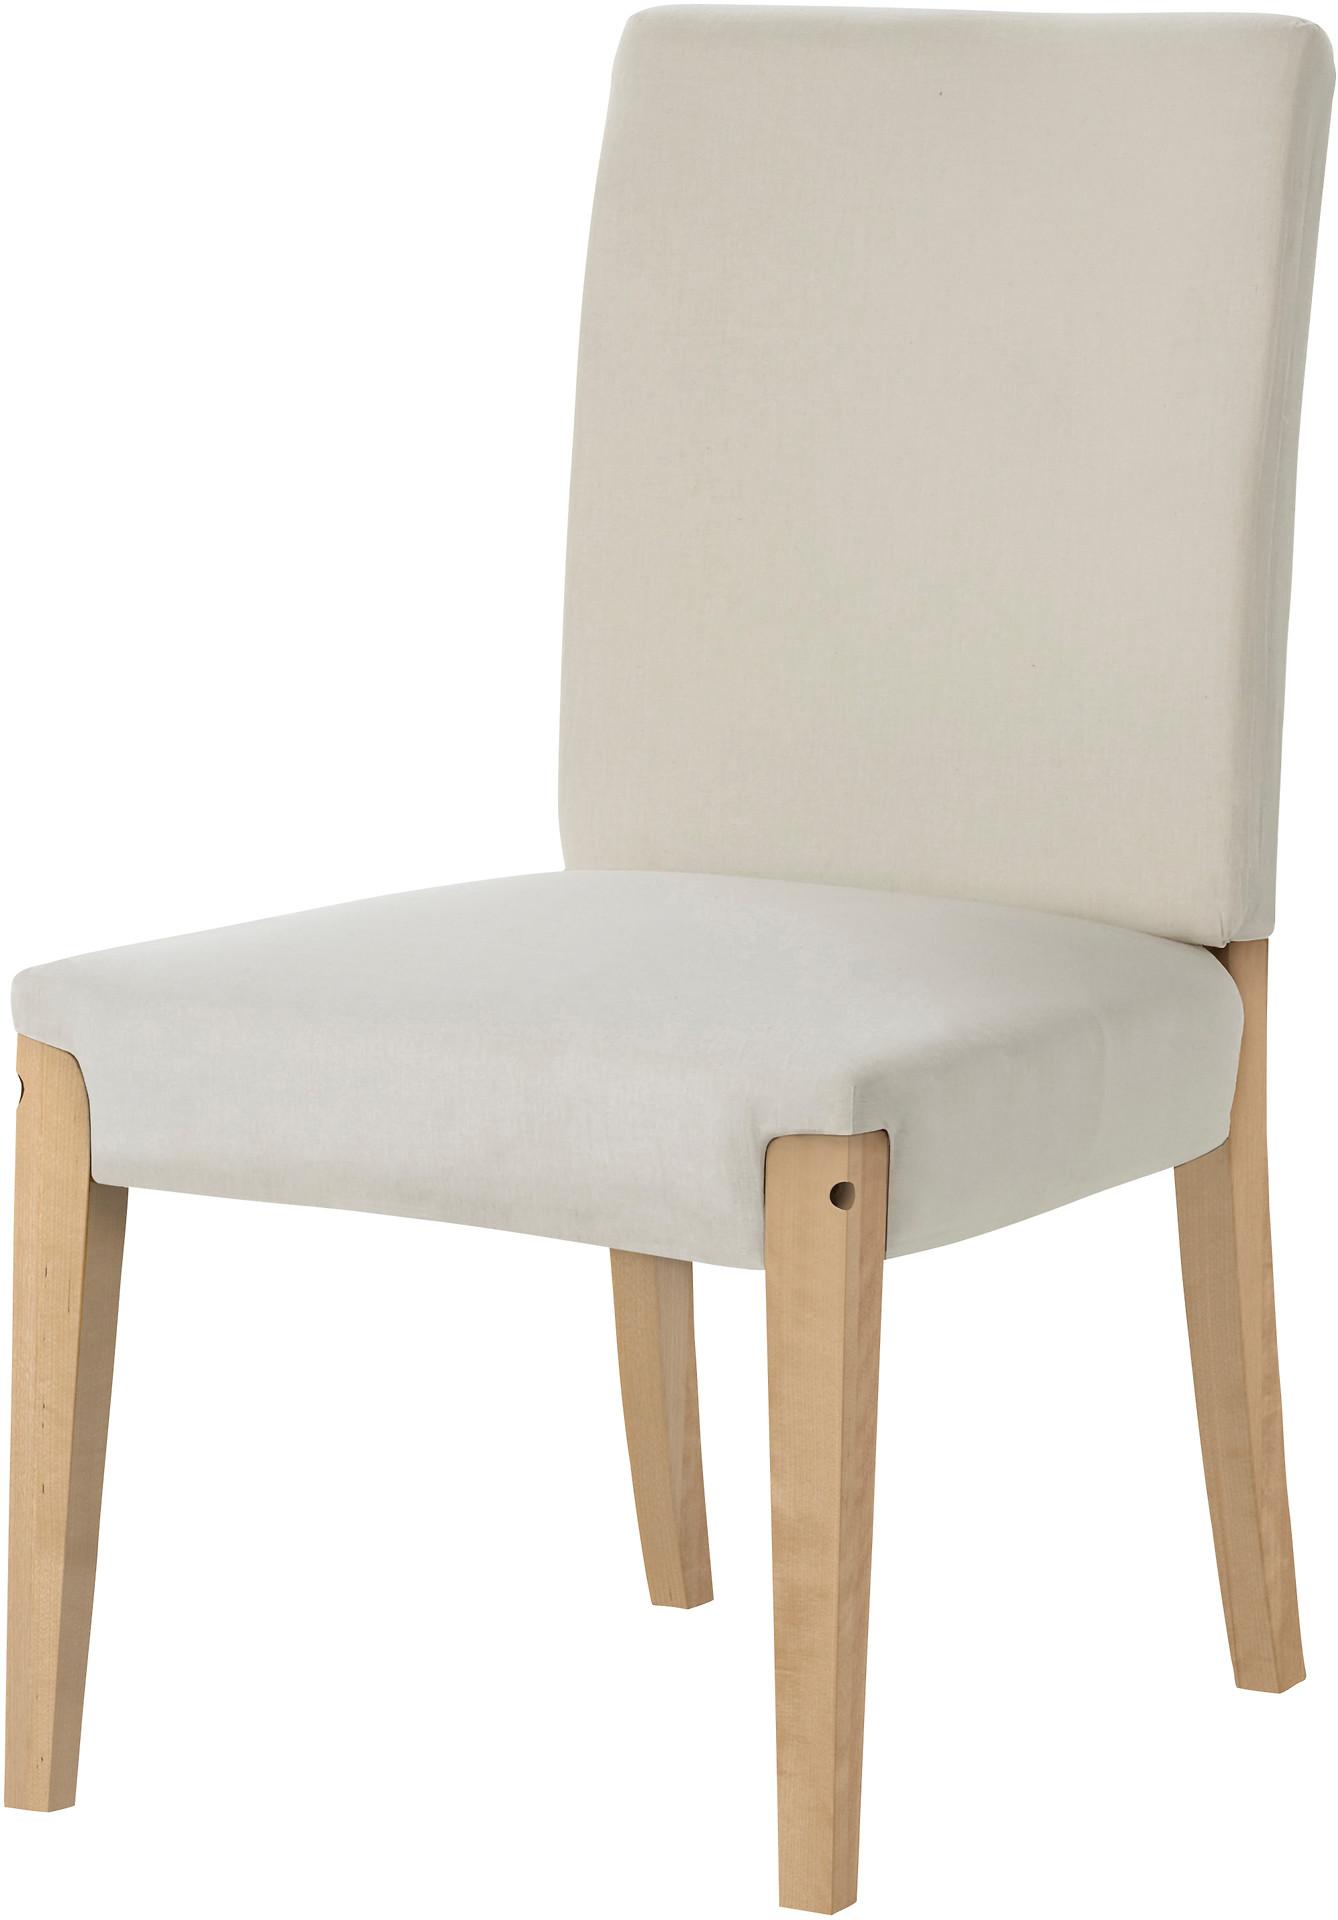 HENRIKSDAL Chair frame - brown - IKEA